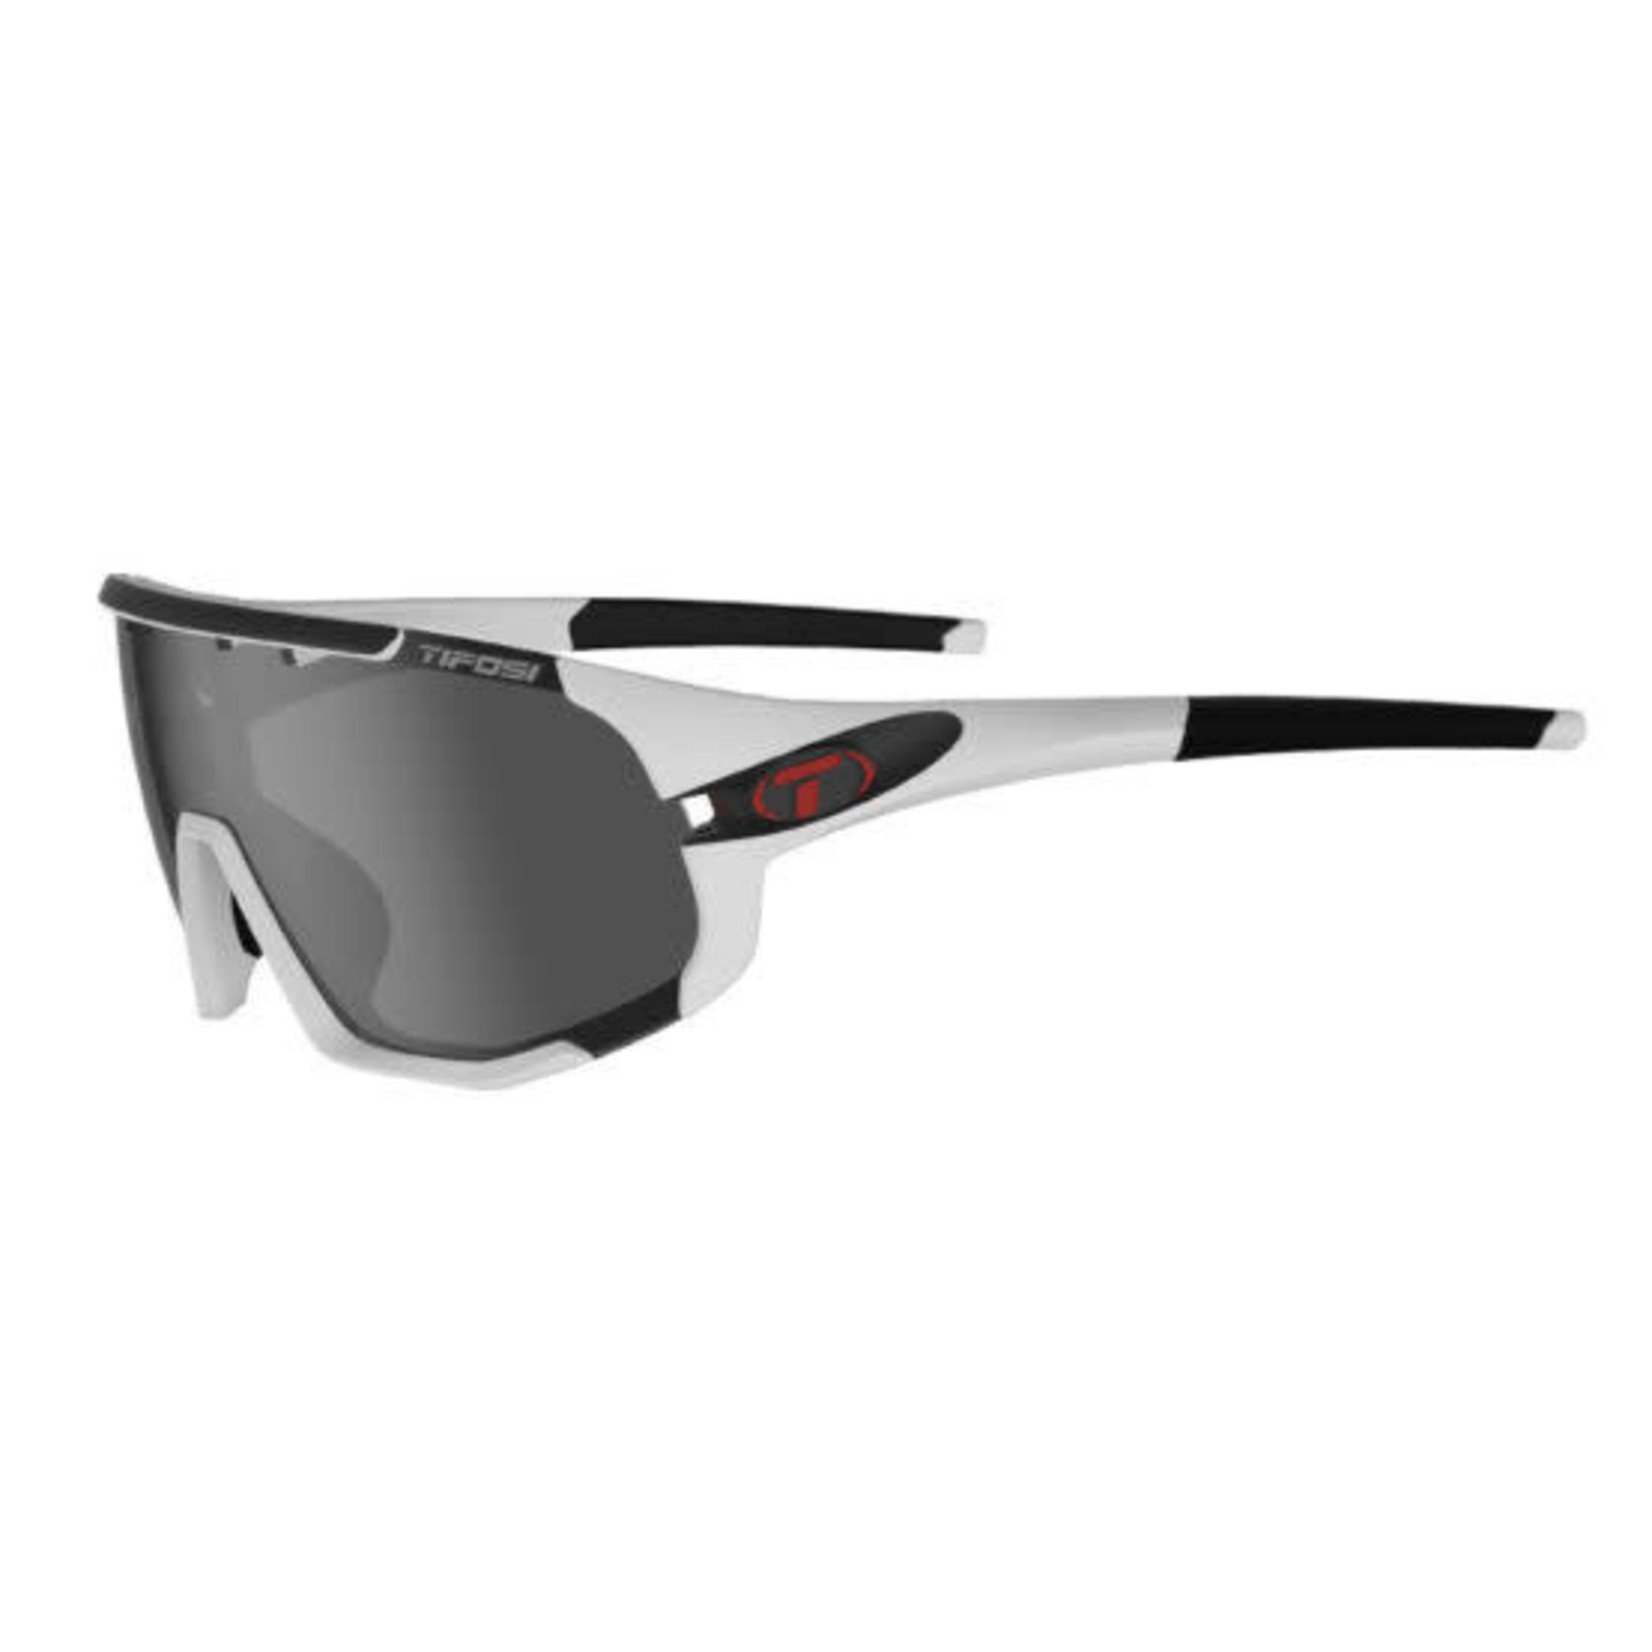 Tifosi Optics Sledge, Matte White Interchangeable Sunglasses